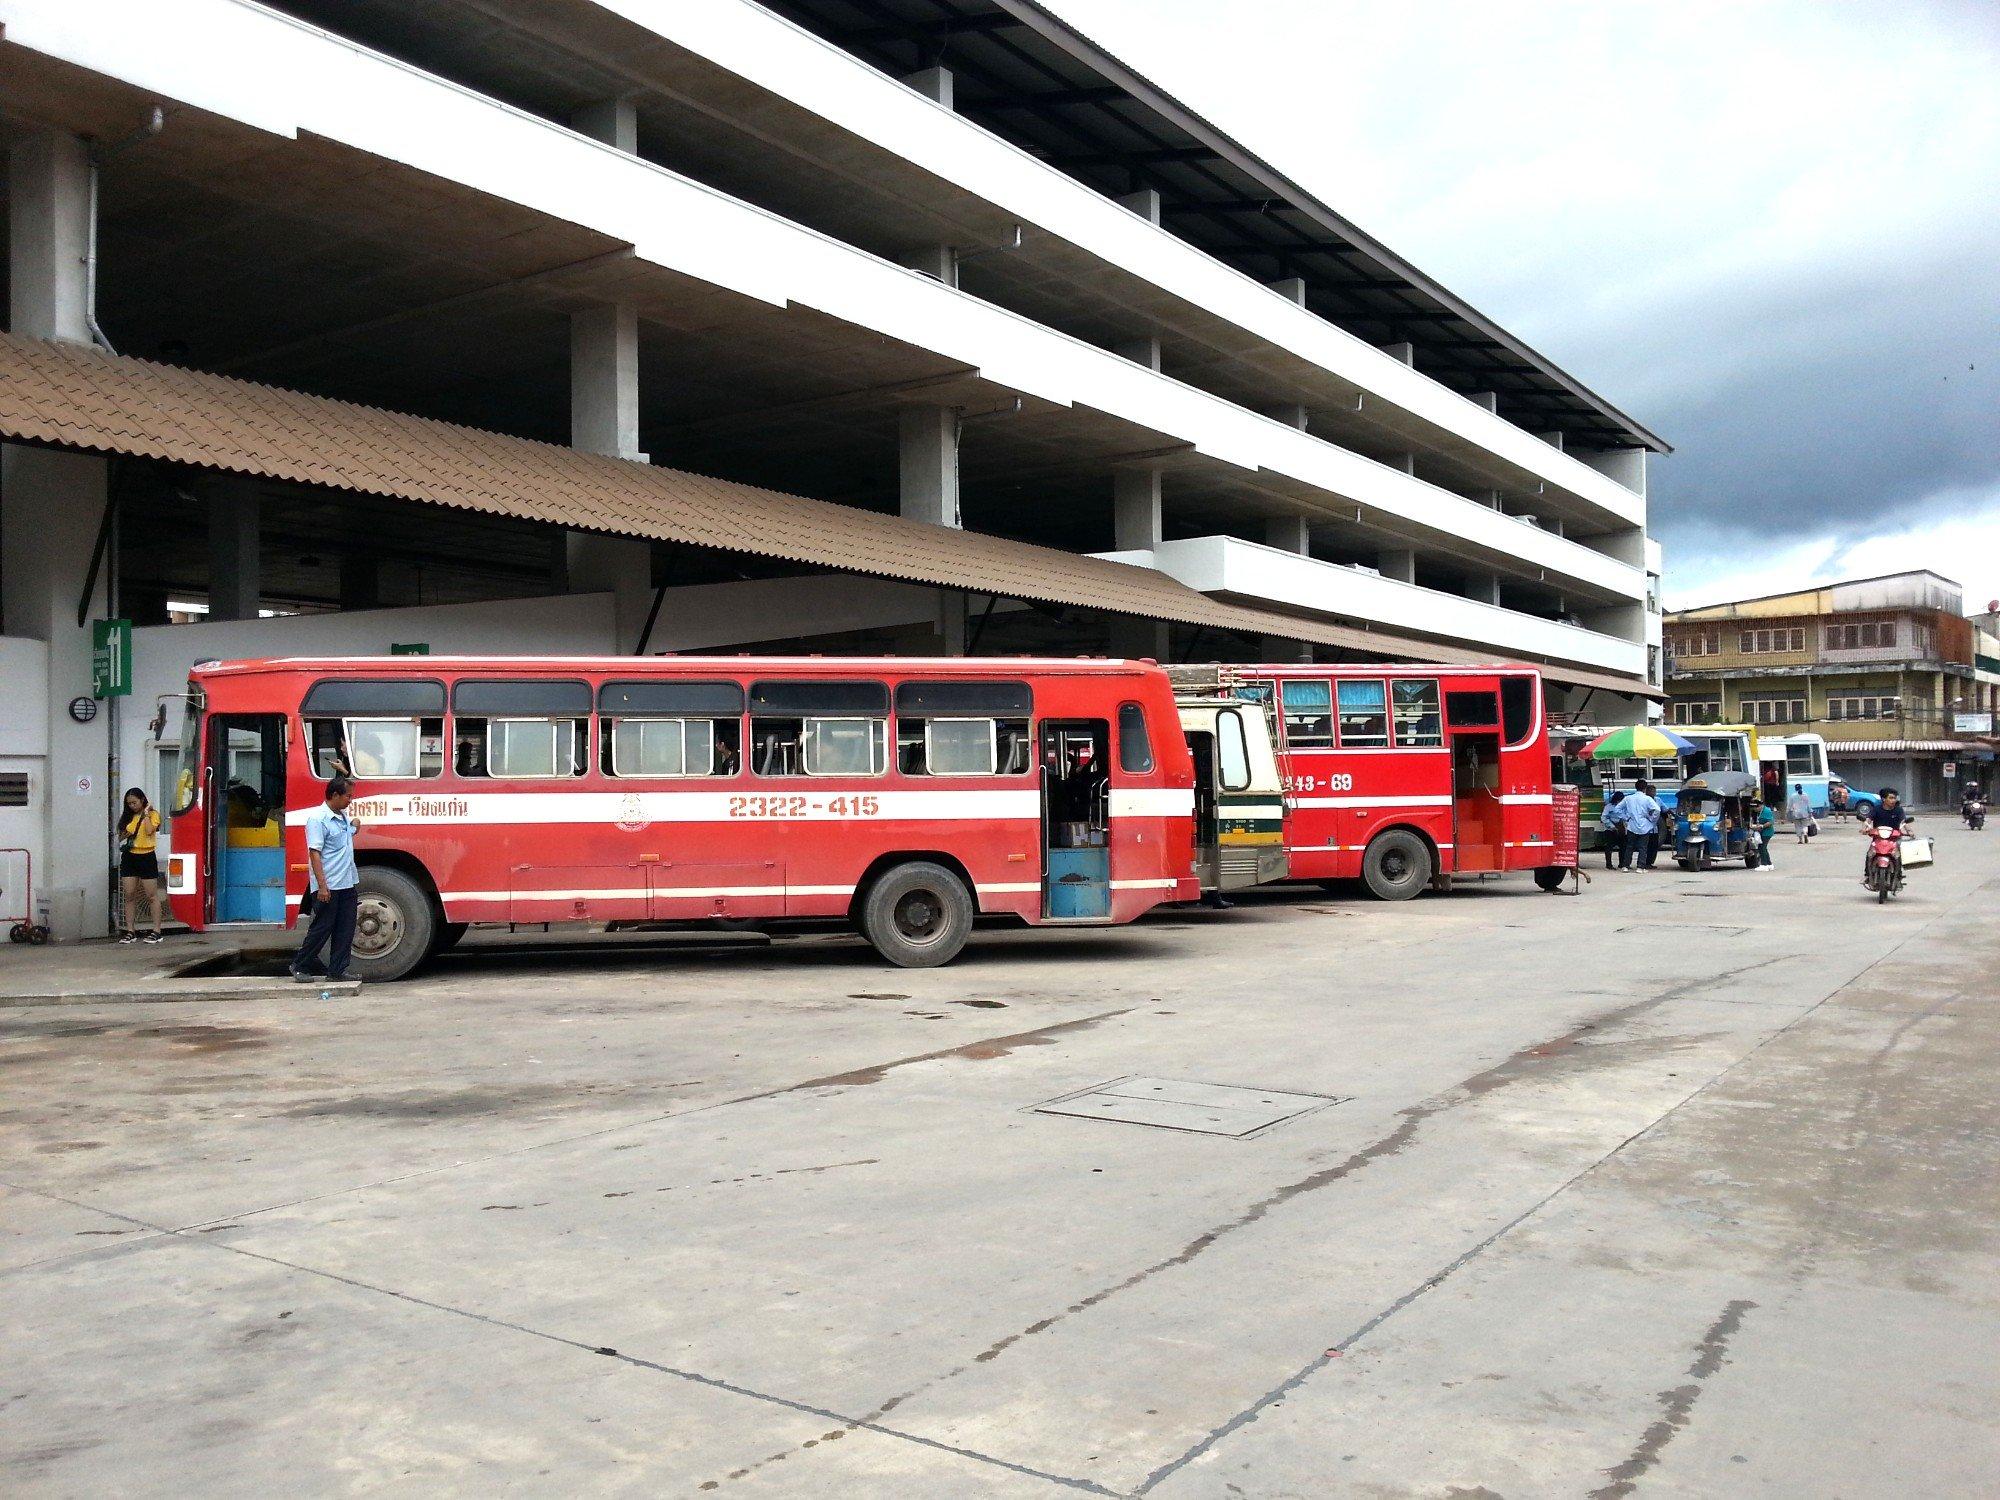 Chiang Rai Bus Terminal 1